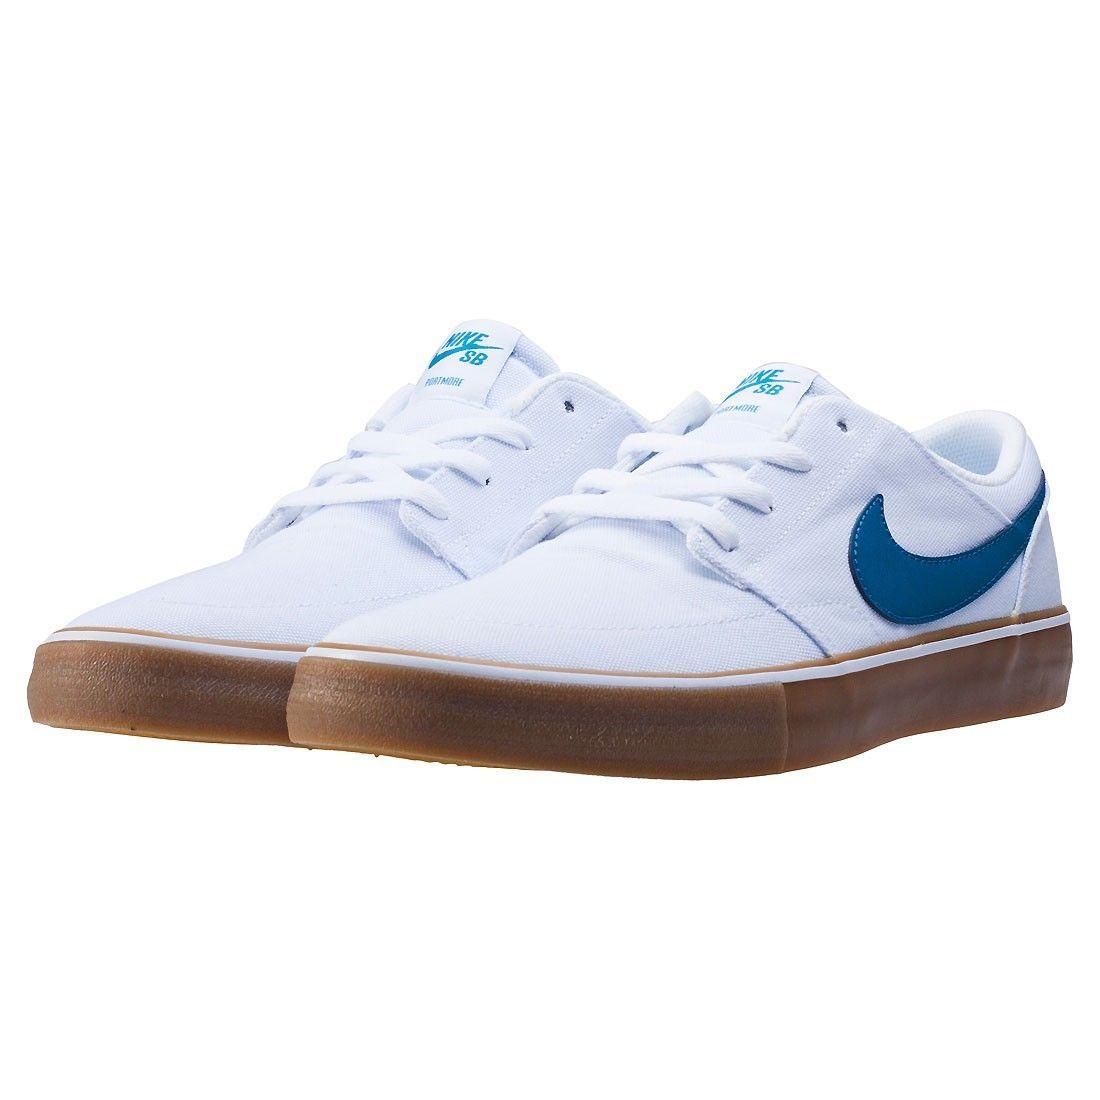 Nike SB Portmore II Solar CNVS Canvas White/Blue Mens Skate Shoes 880268-149 image 4